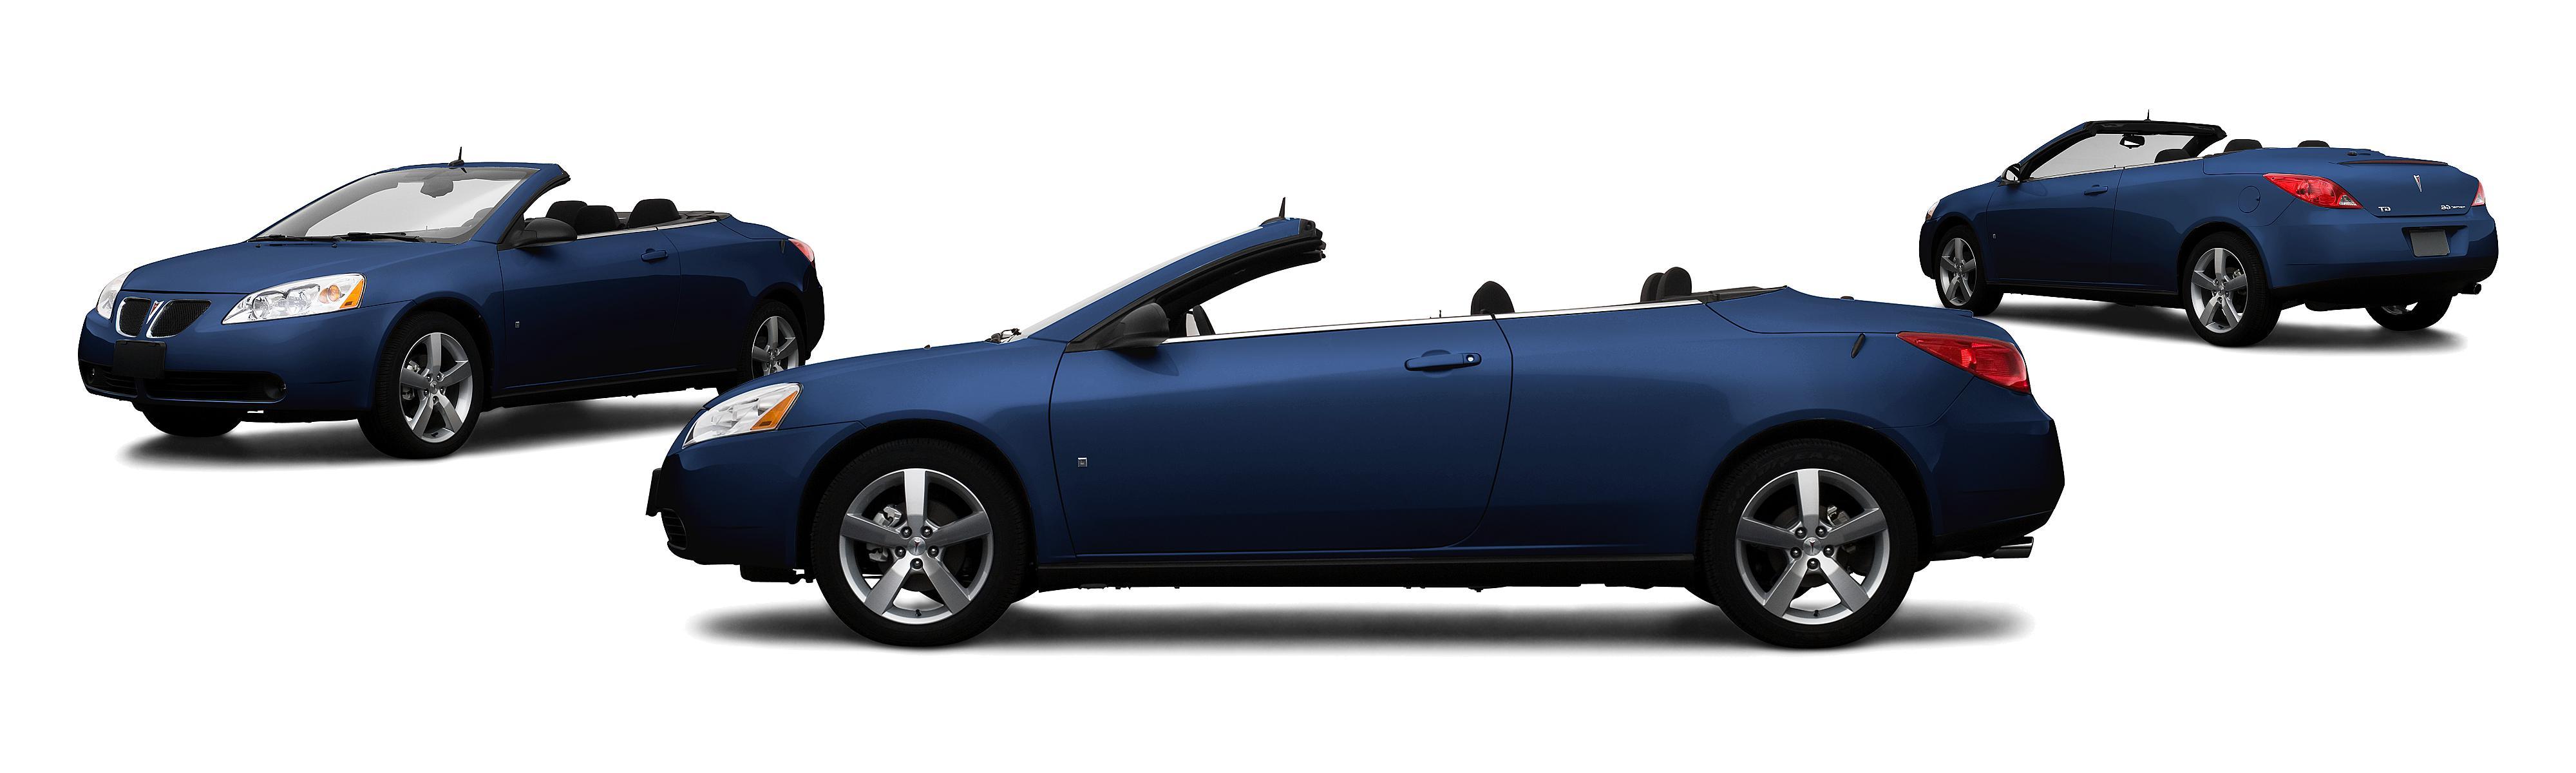 2009 pontiac g6 gt 2dr convertible w 1sb research groovecar rh groovecar com